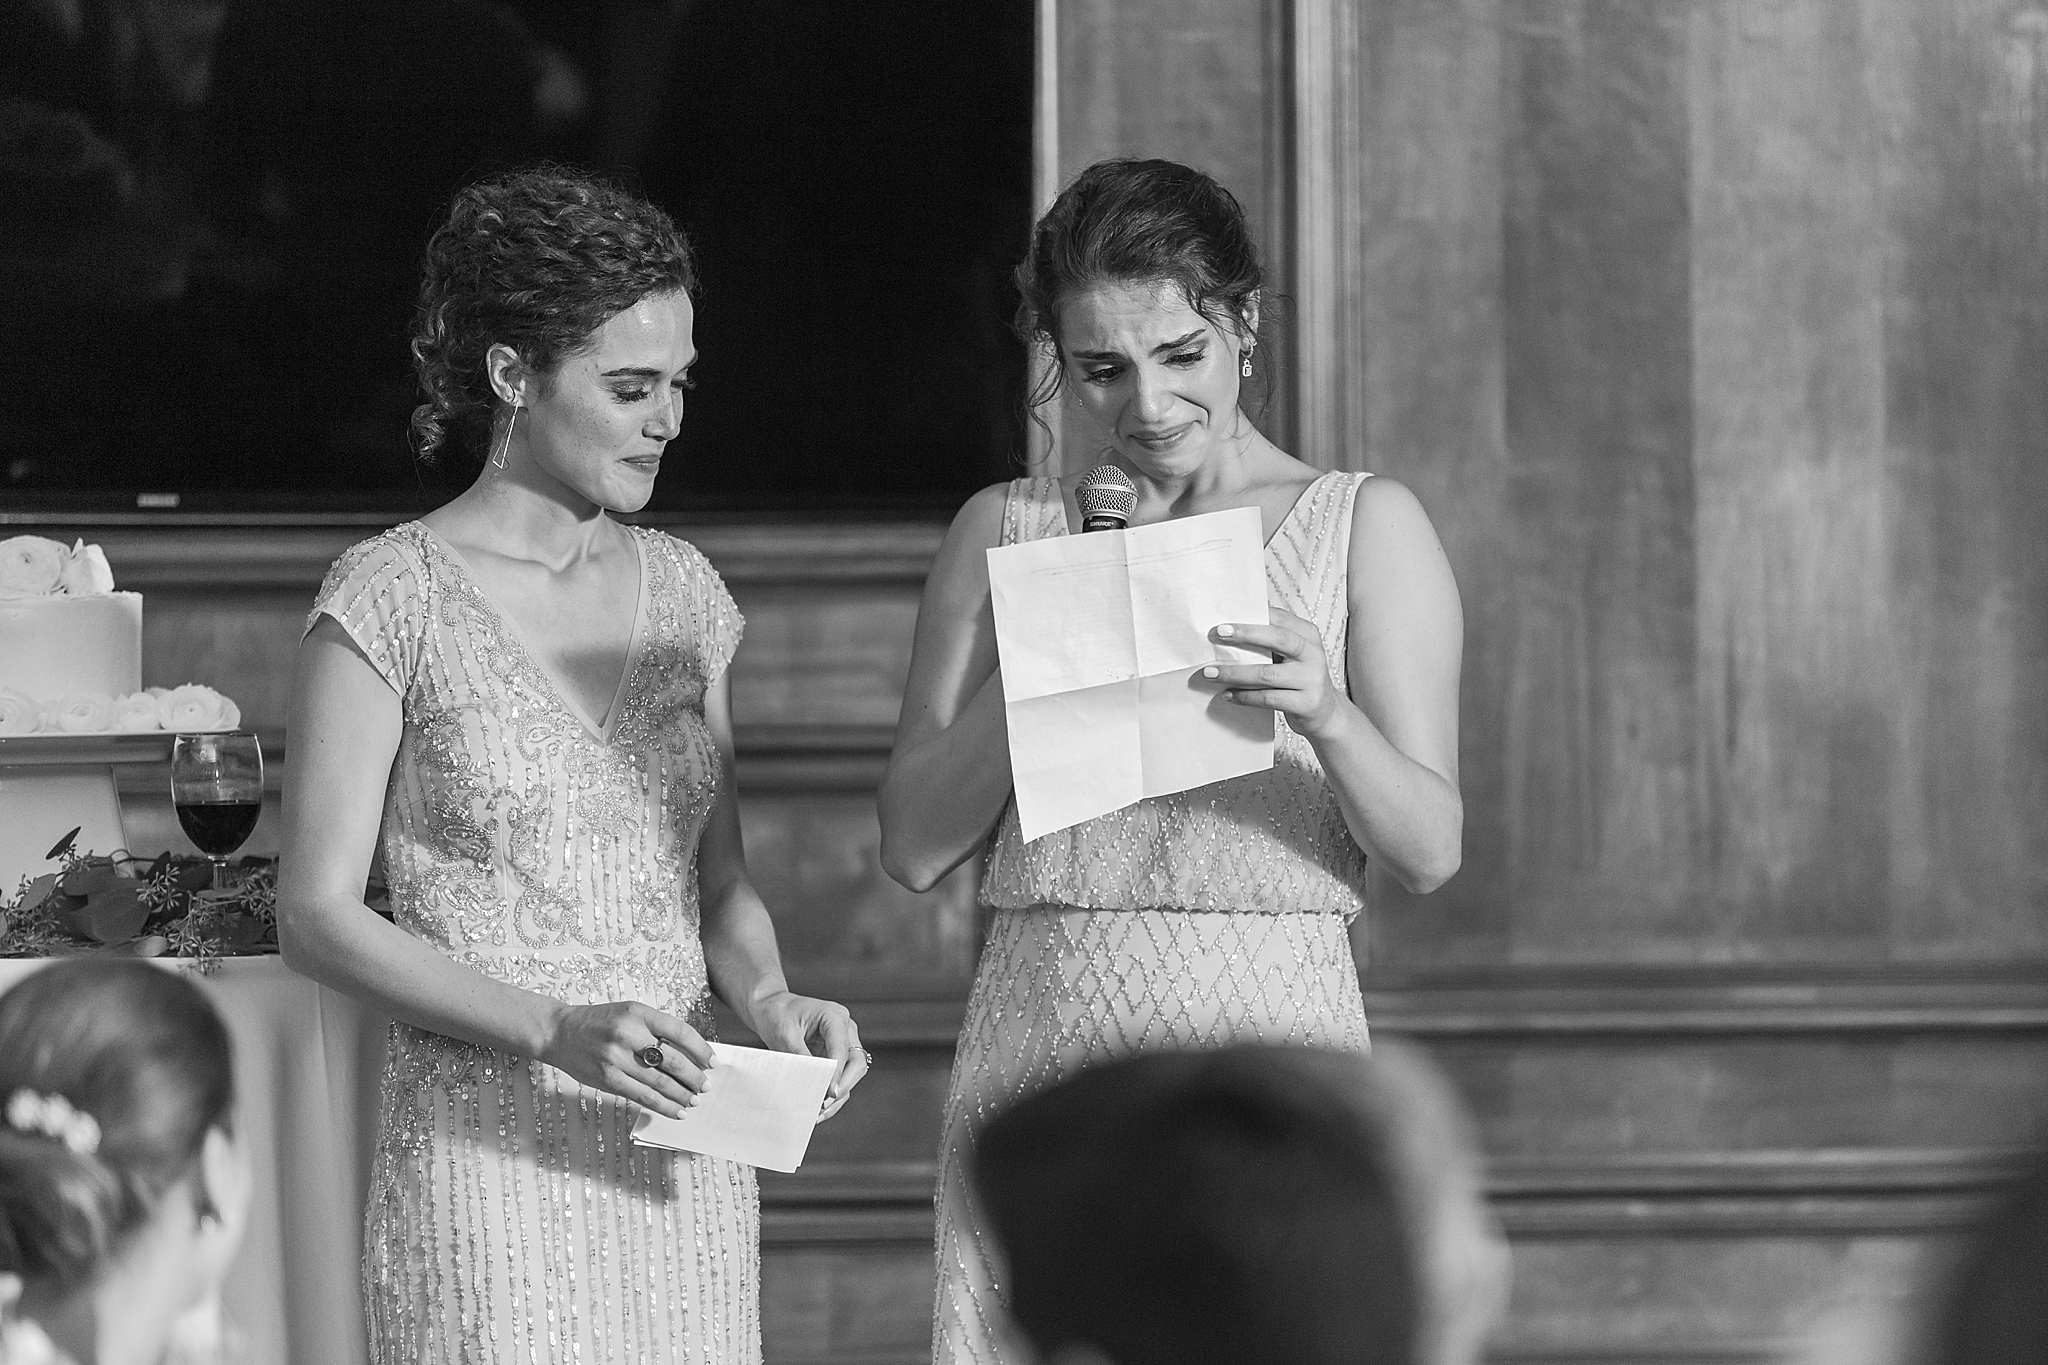 detroit-wedding-photographer-grosse-pointe-academy-chapel-detroit-golf-club-wedding-carly-matt-by-courtney-carolyn-photography_0099.jpg